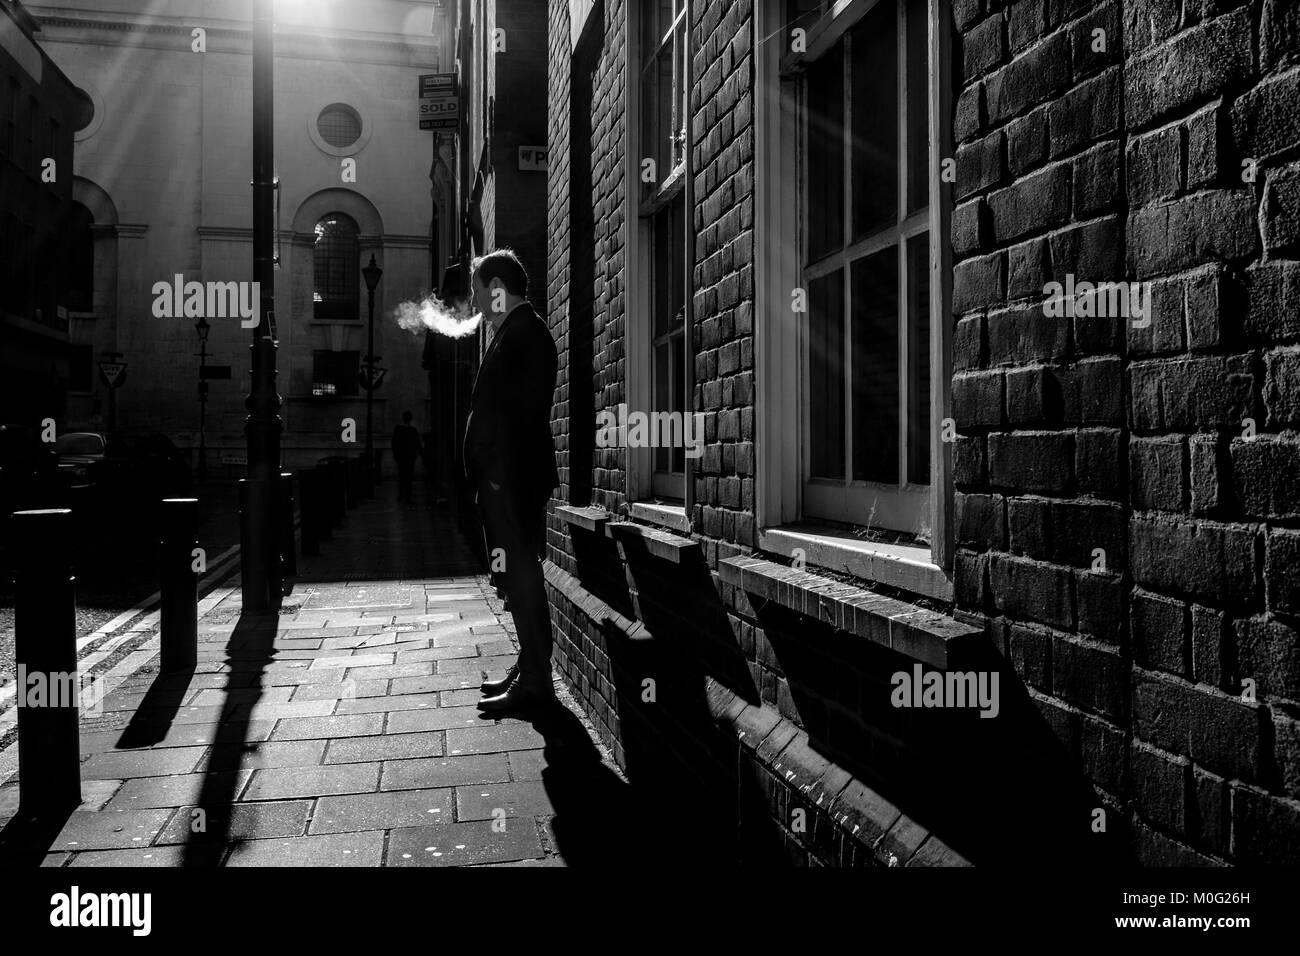 London Black and white street photography: Man smoking in street. - Stock Image